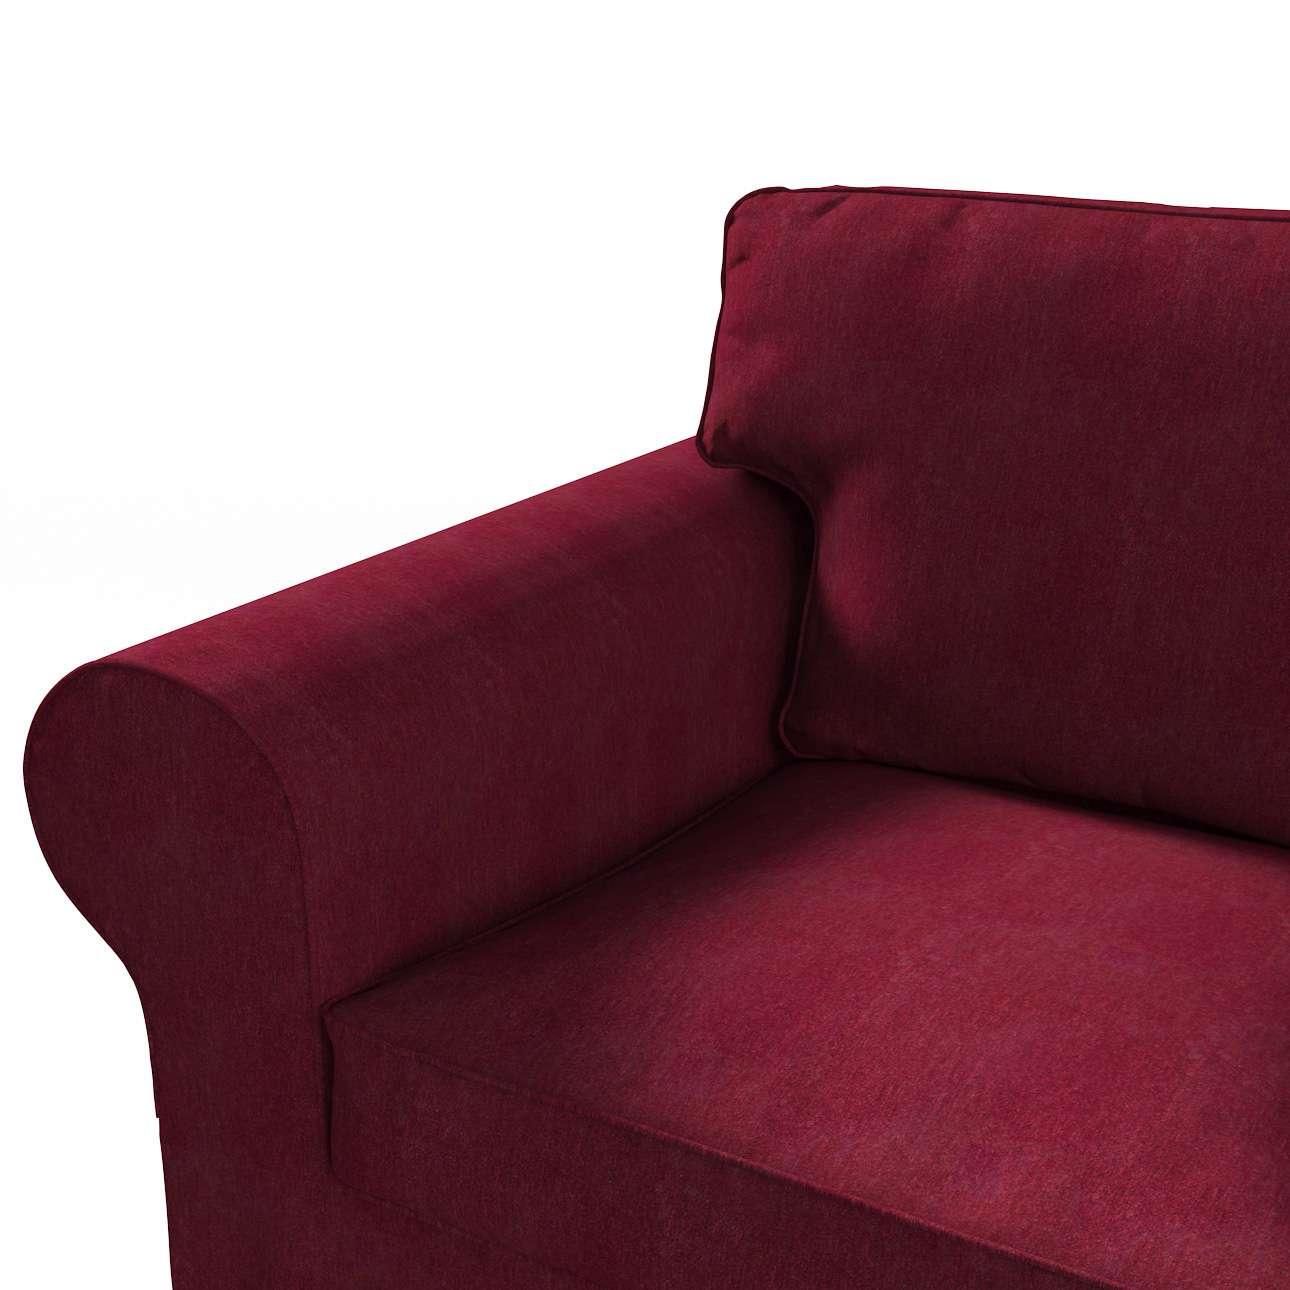 Ektorp 3-Sitzer Schlafsofabezug, ALTES Modell Sofahusse Ektorp 3-Sitzer Schlafsofa von der Kollektion Chenille , Stoff: 702-19